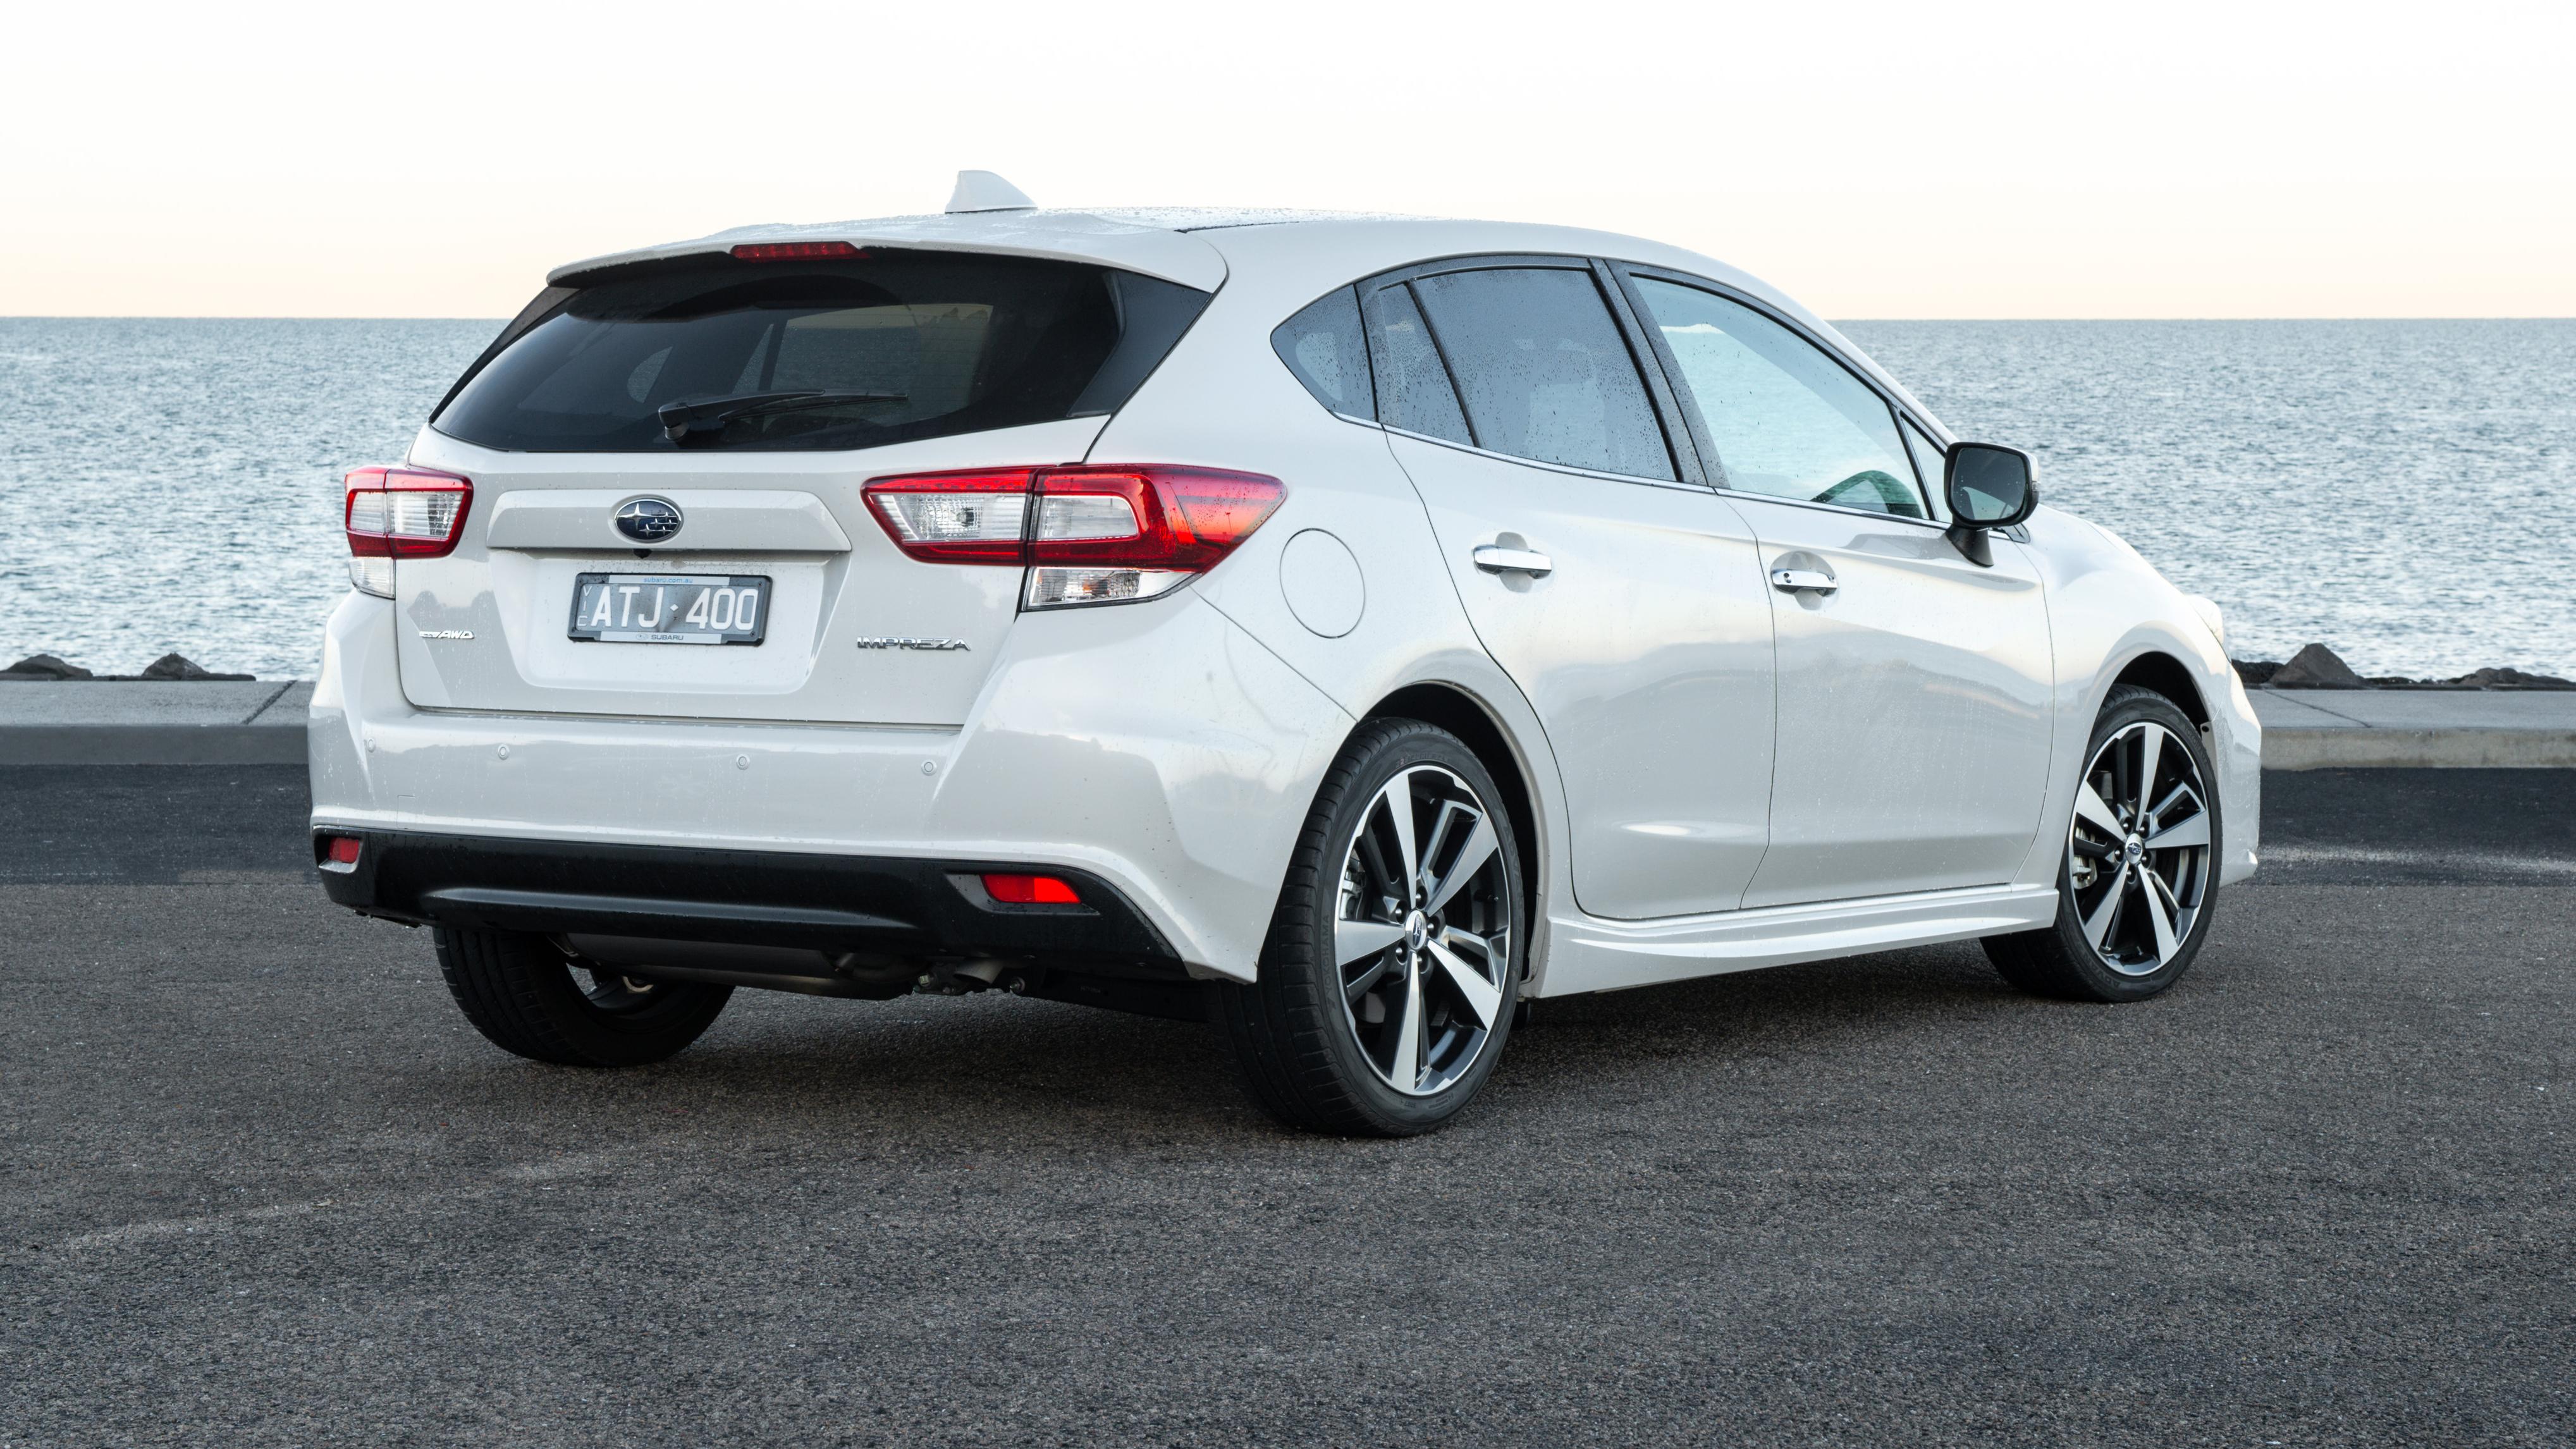 2018 Subaru Impreza 2 0i-S review | CarAdvice